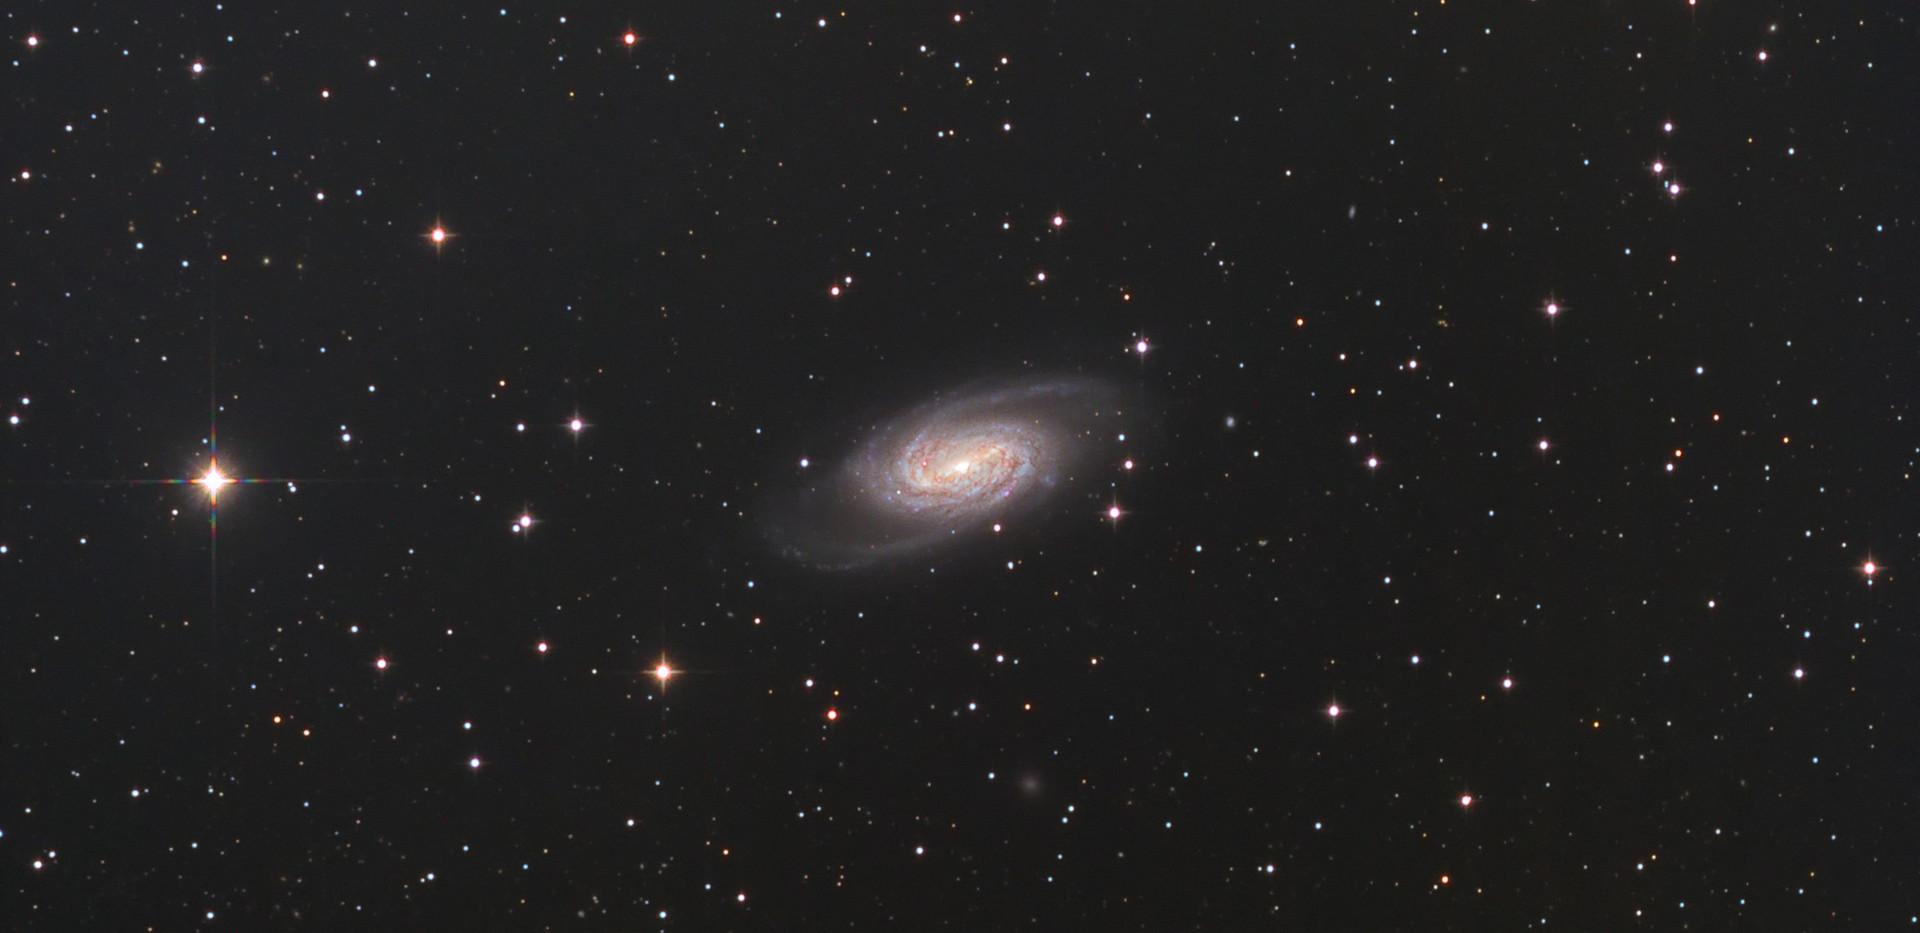 NGC2903_20171227_HSDO_FDK250-S001_Crux20